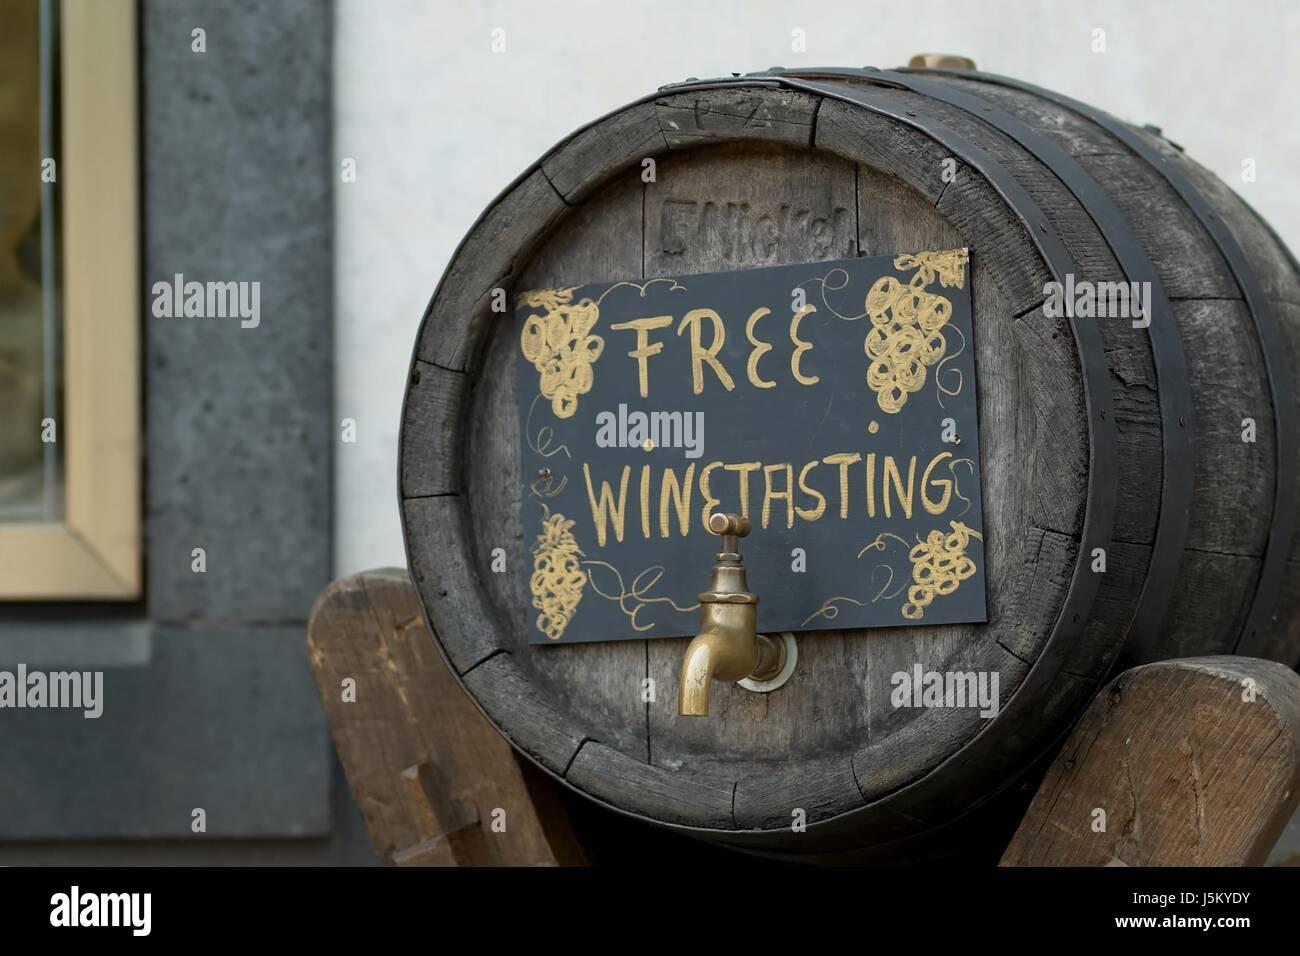 detail admission free tap wine cask vine tasting jacked